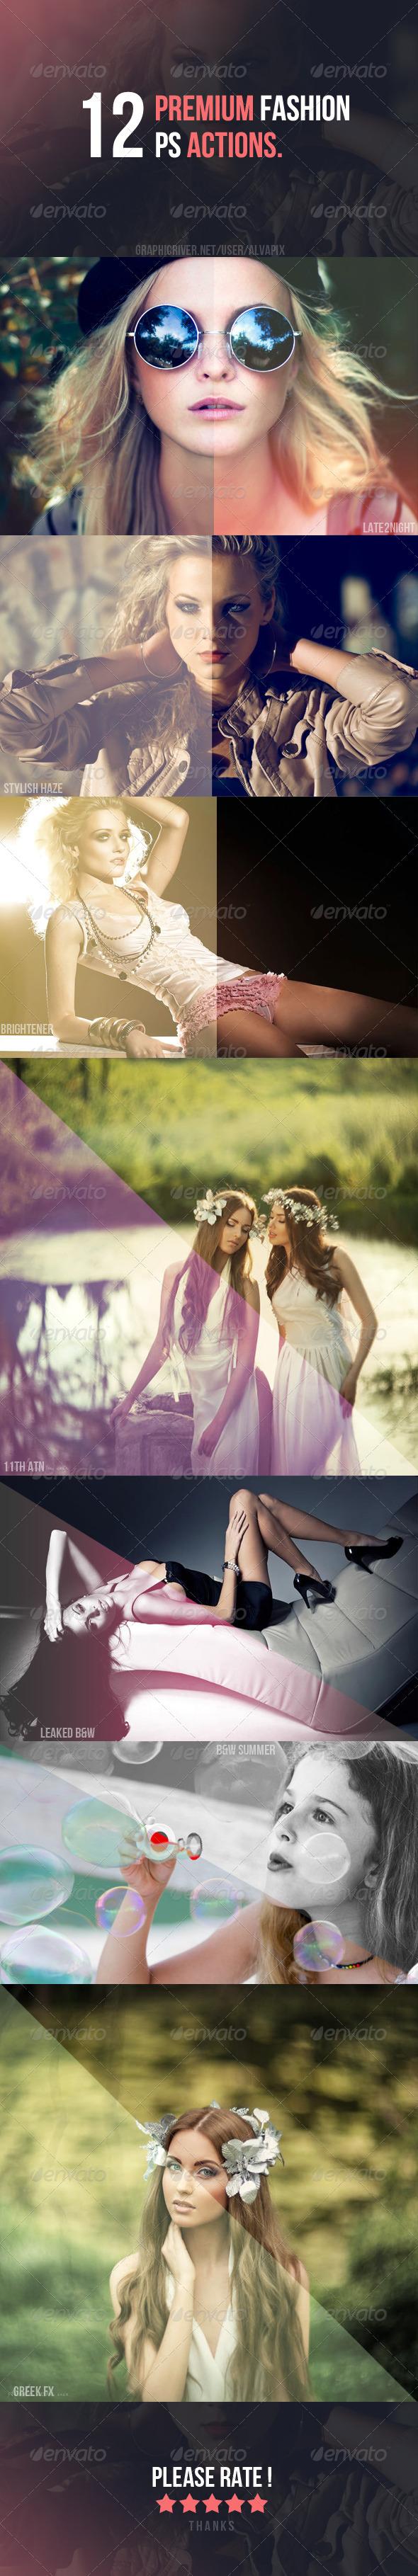 GraphicRiver 12 Fashion Premium Actions 5315695